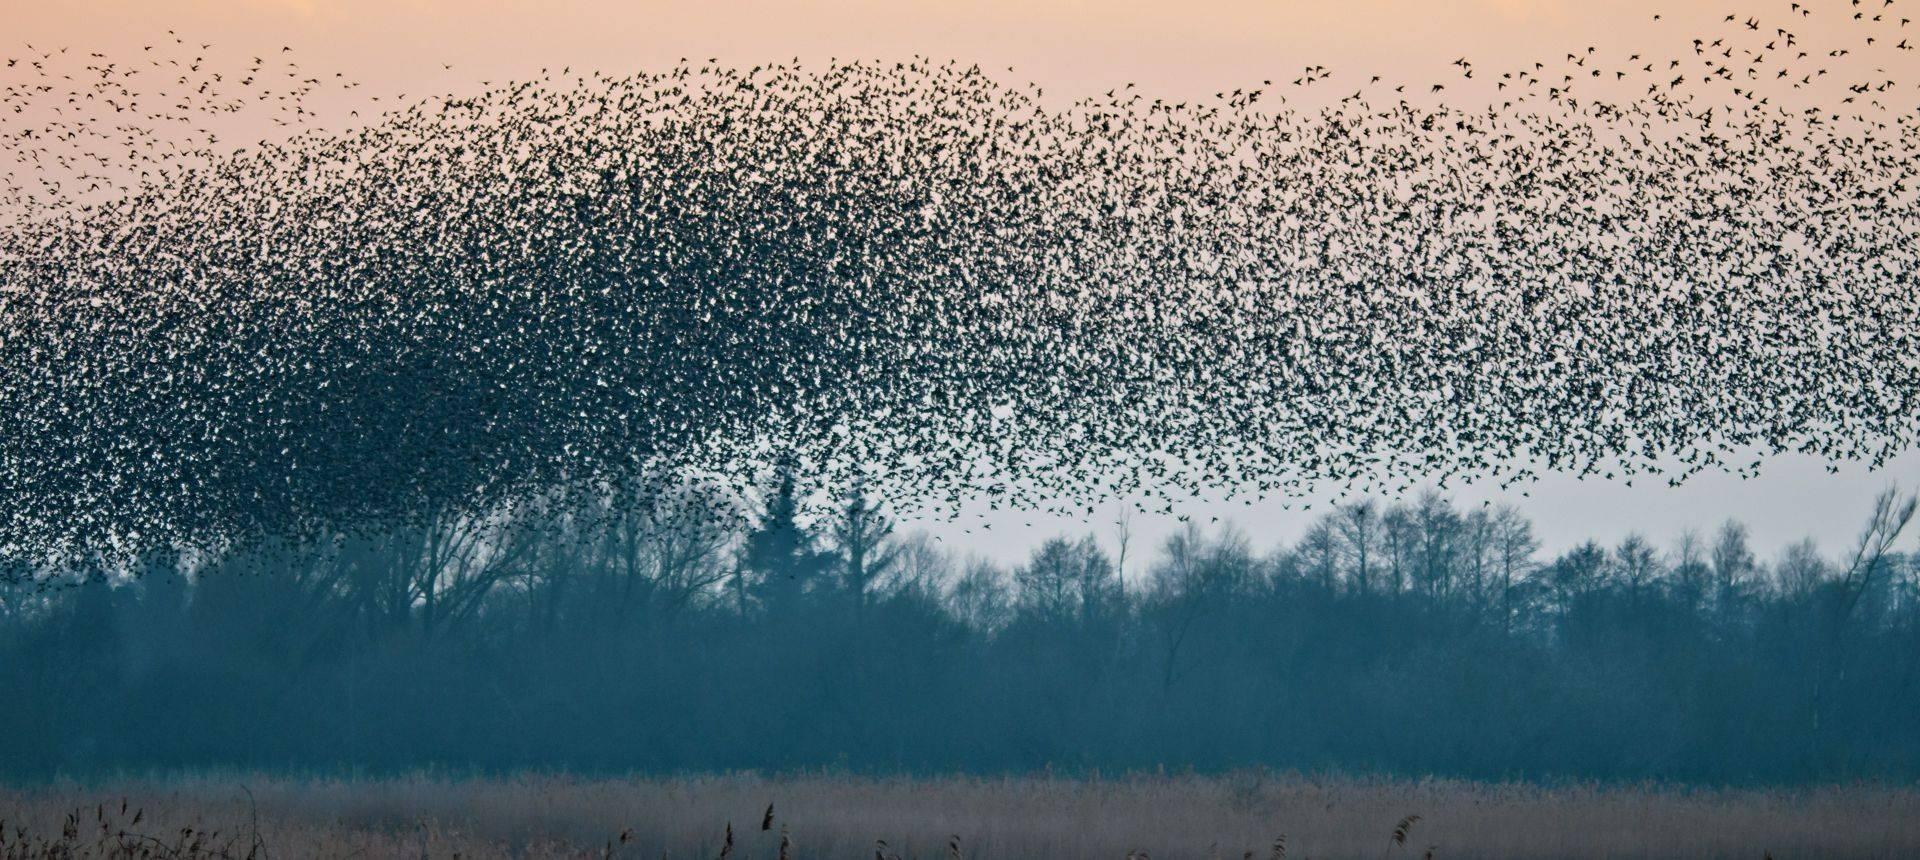 Starling Murmuration, Somerset, England Shutterstock 562750975